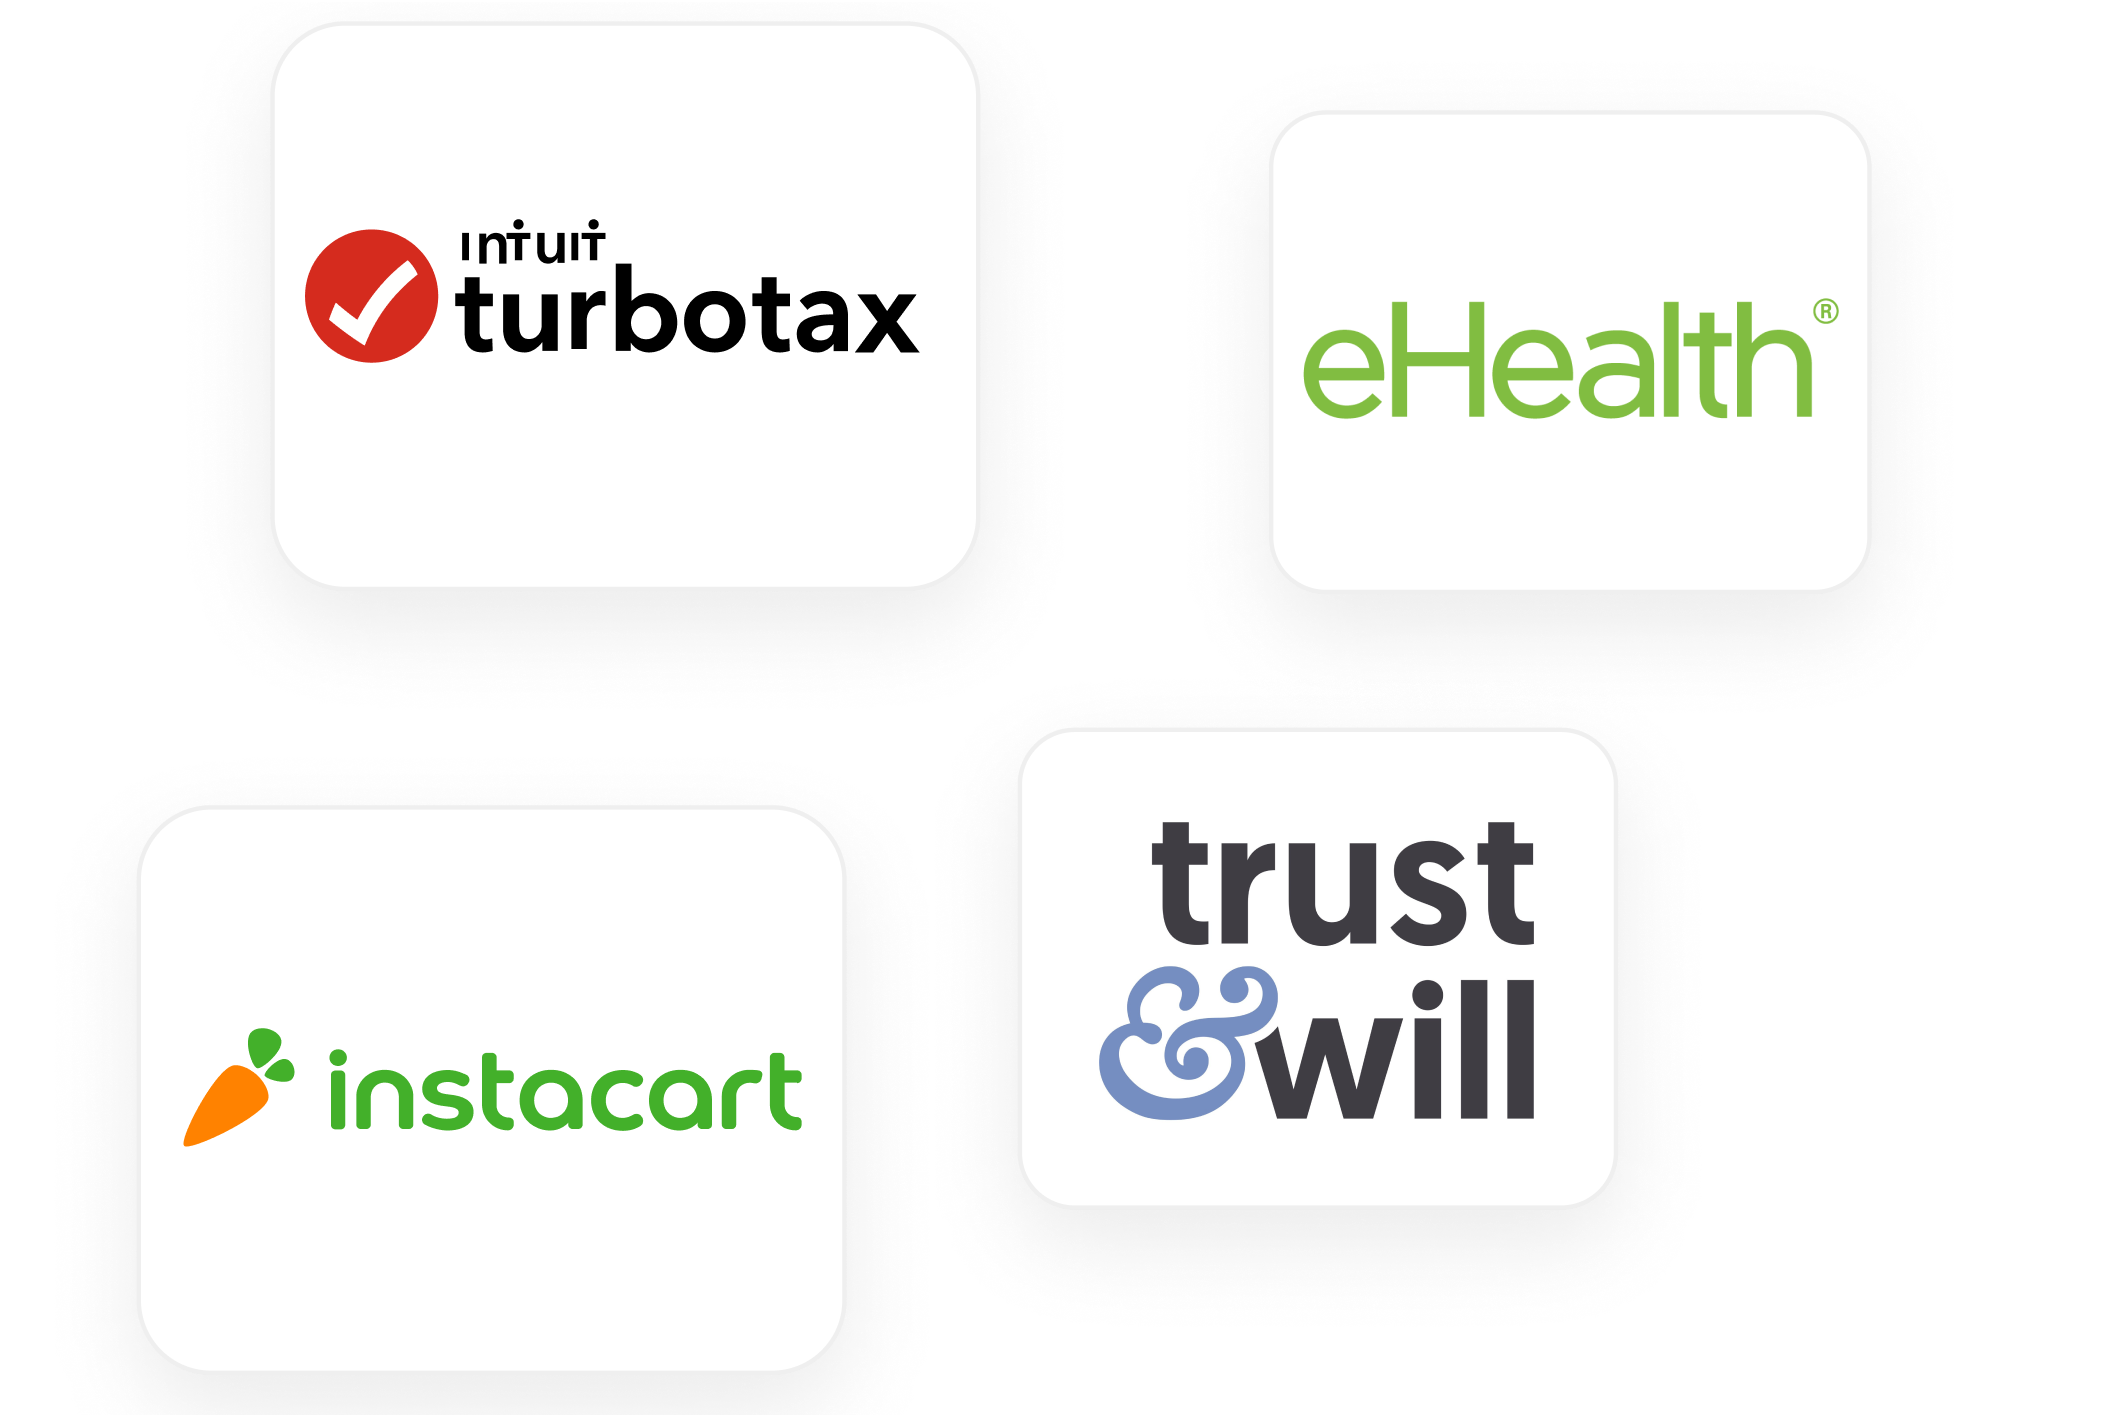 Silvur's brand partners